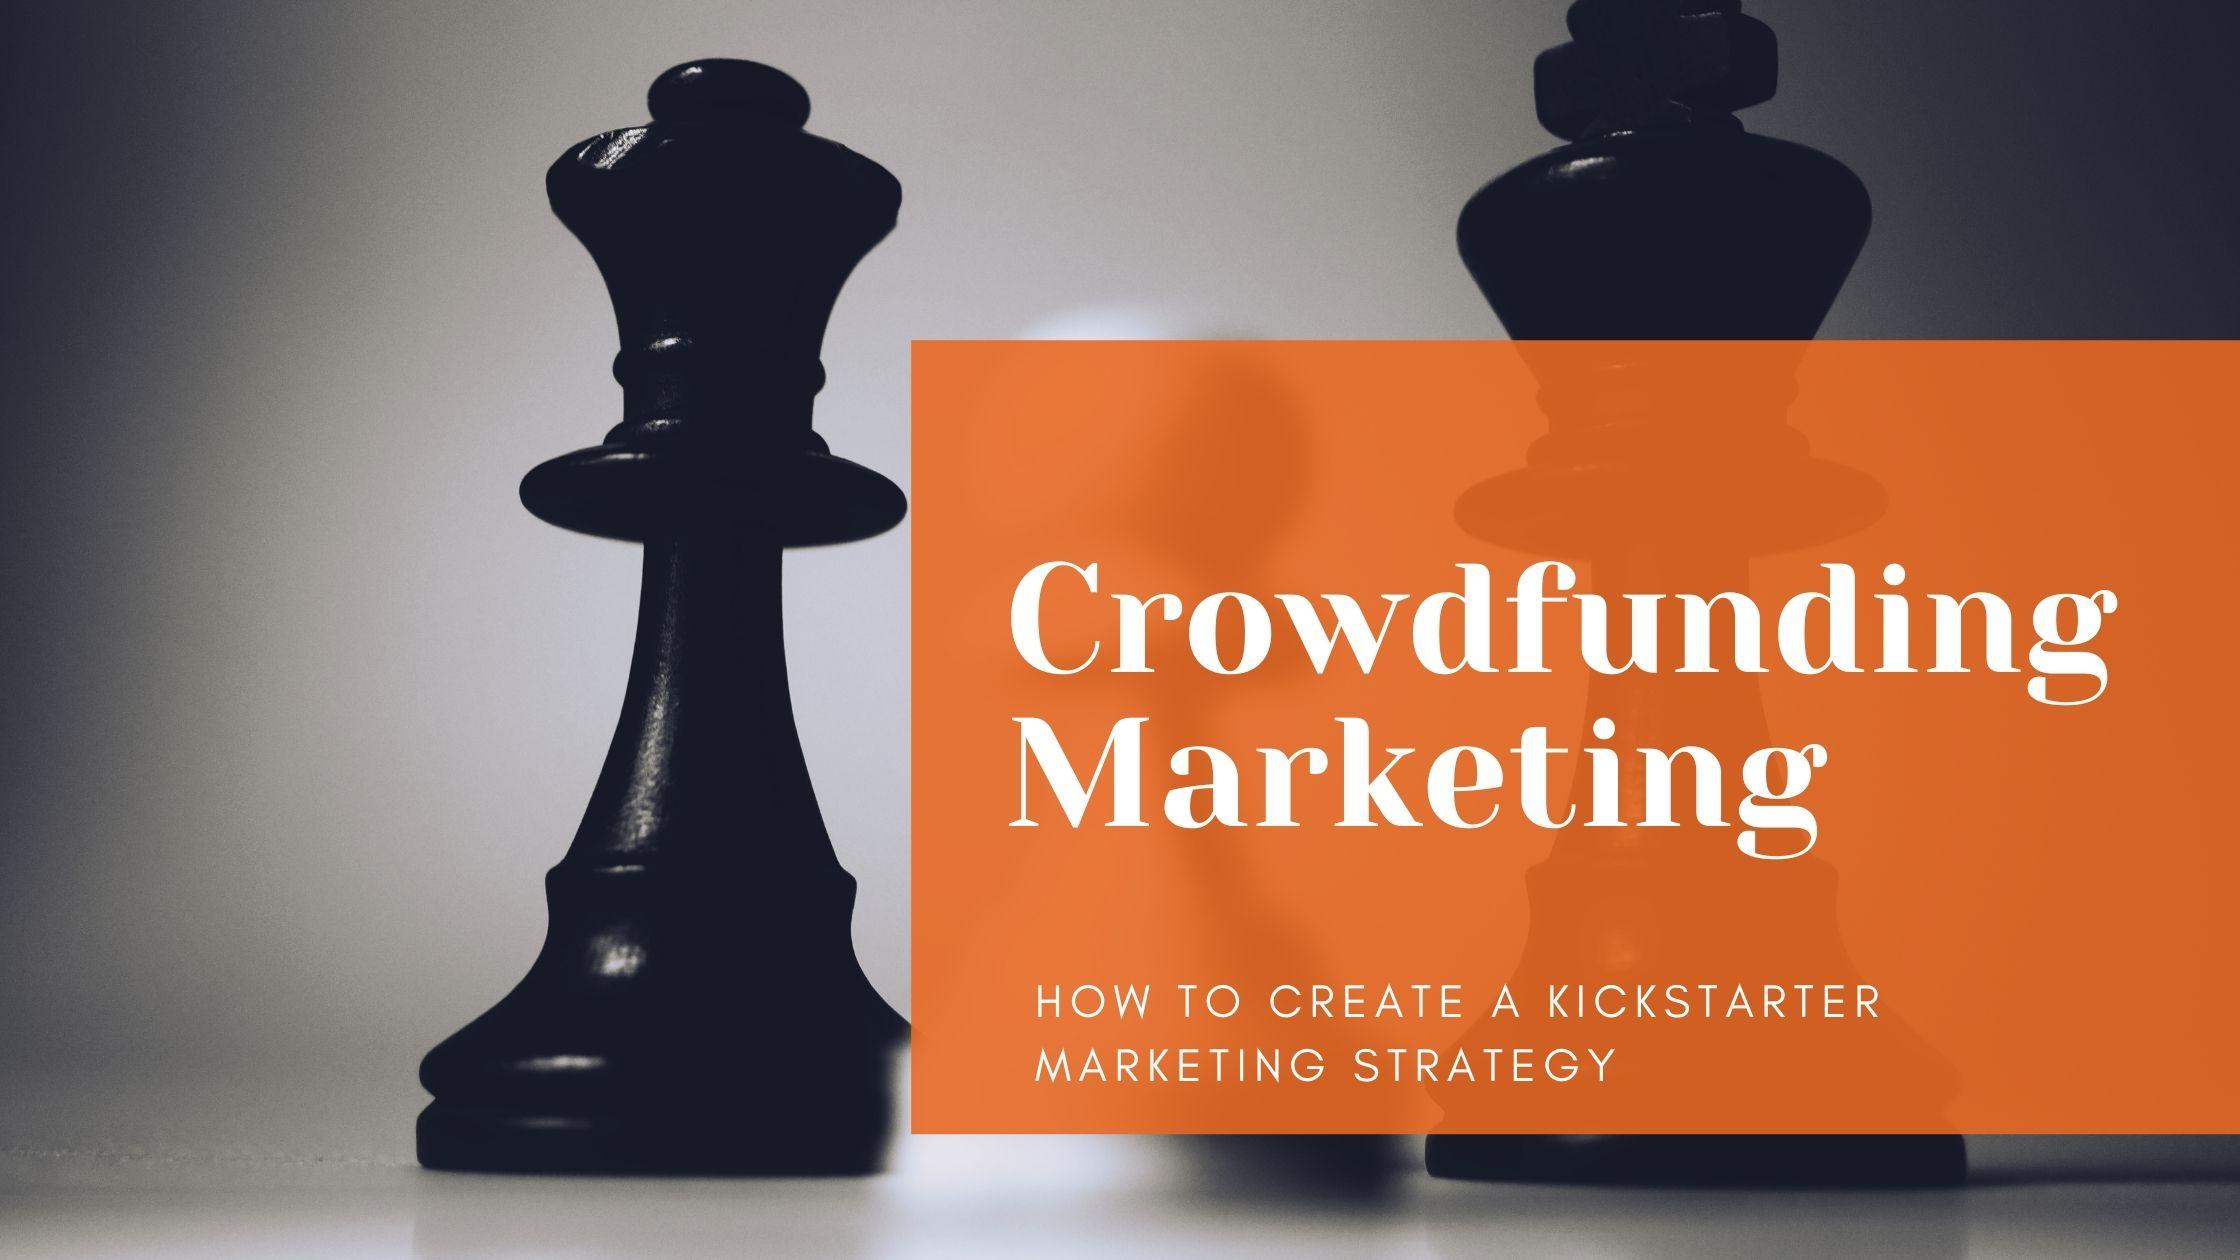 crowdfunding marketing strategy